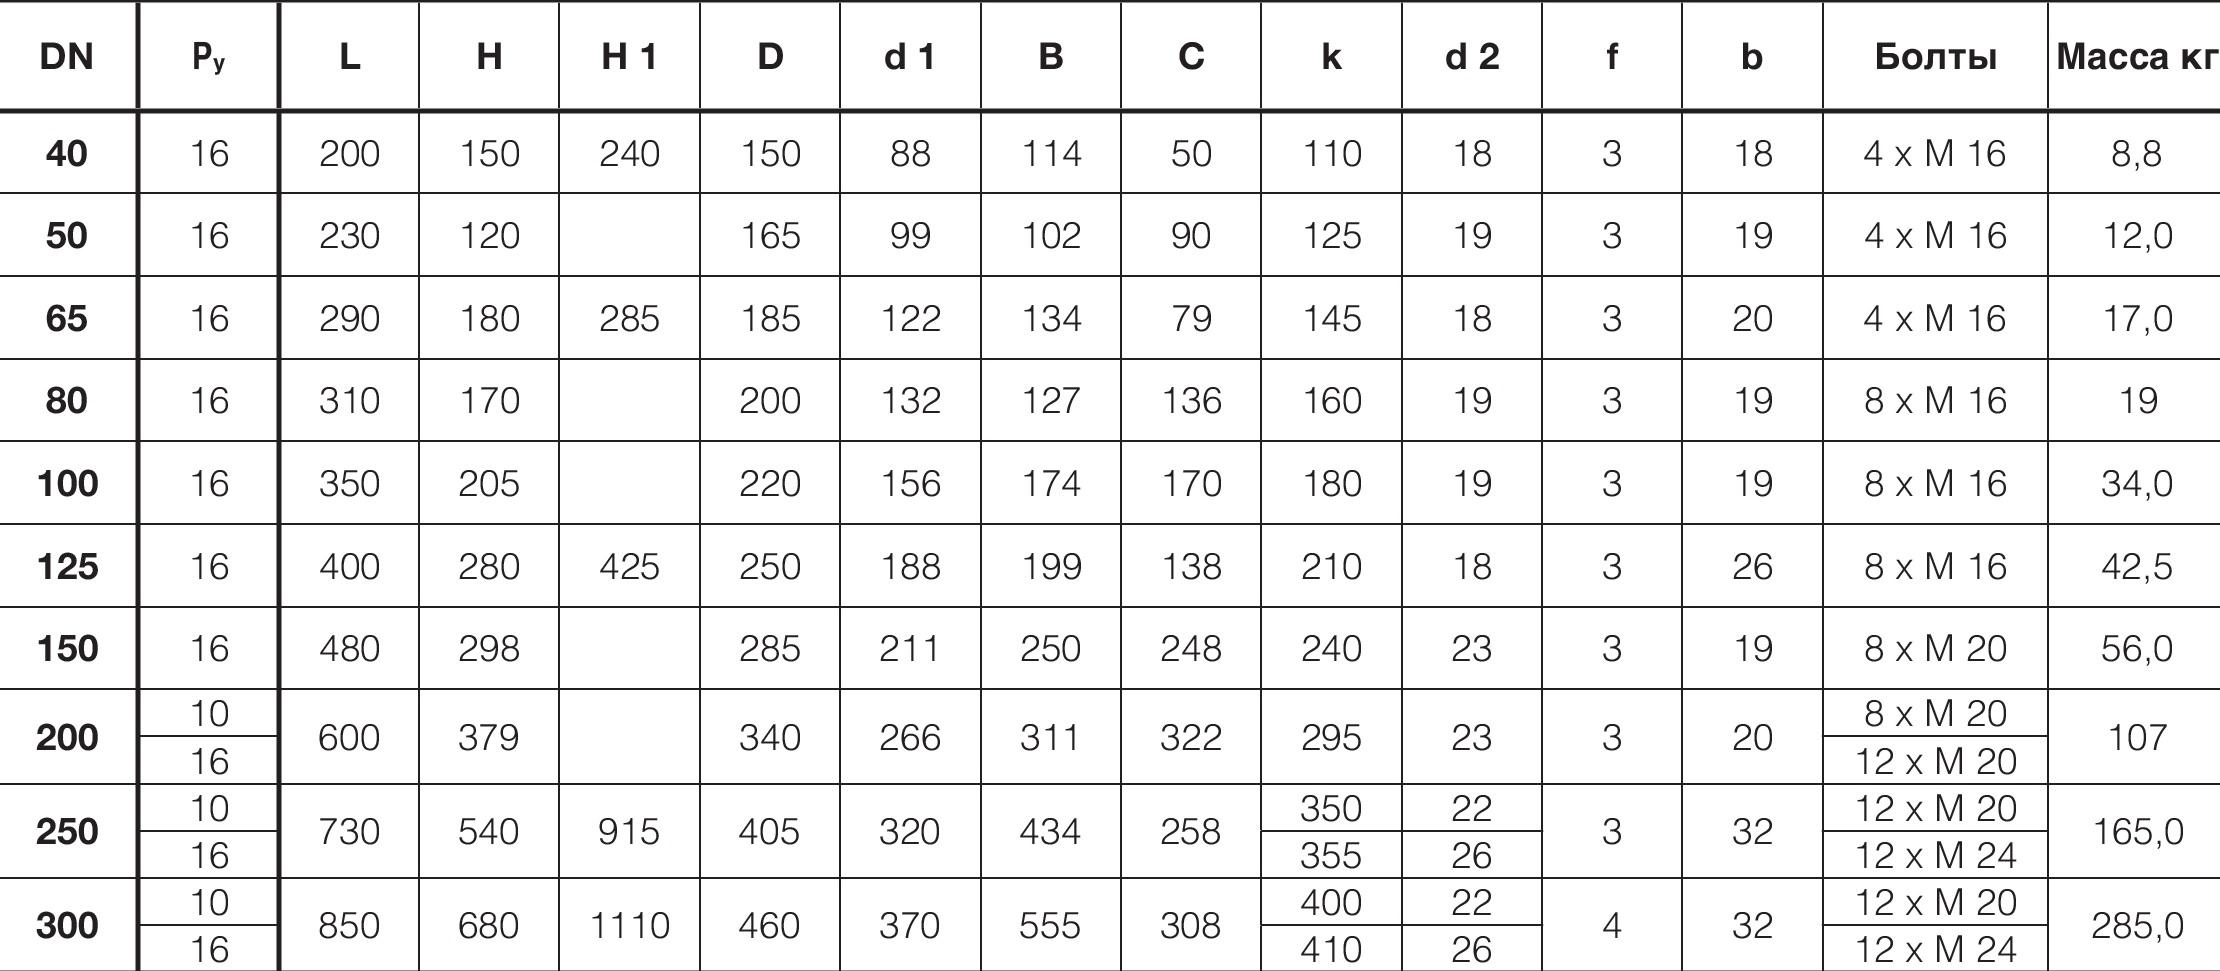 Таблица характеристик для Фильтр сетчатый Hawle 9910